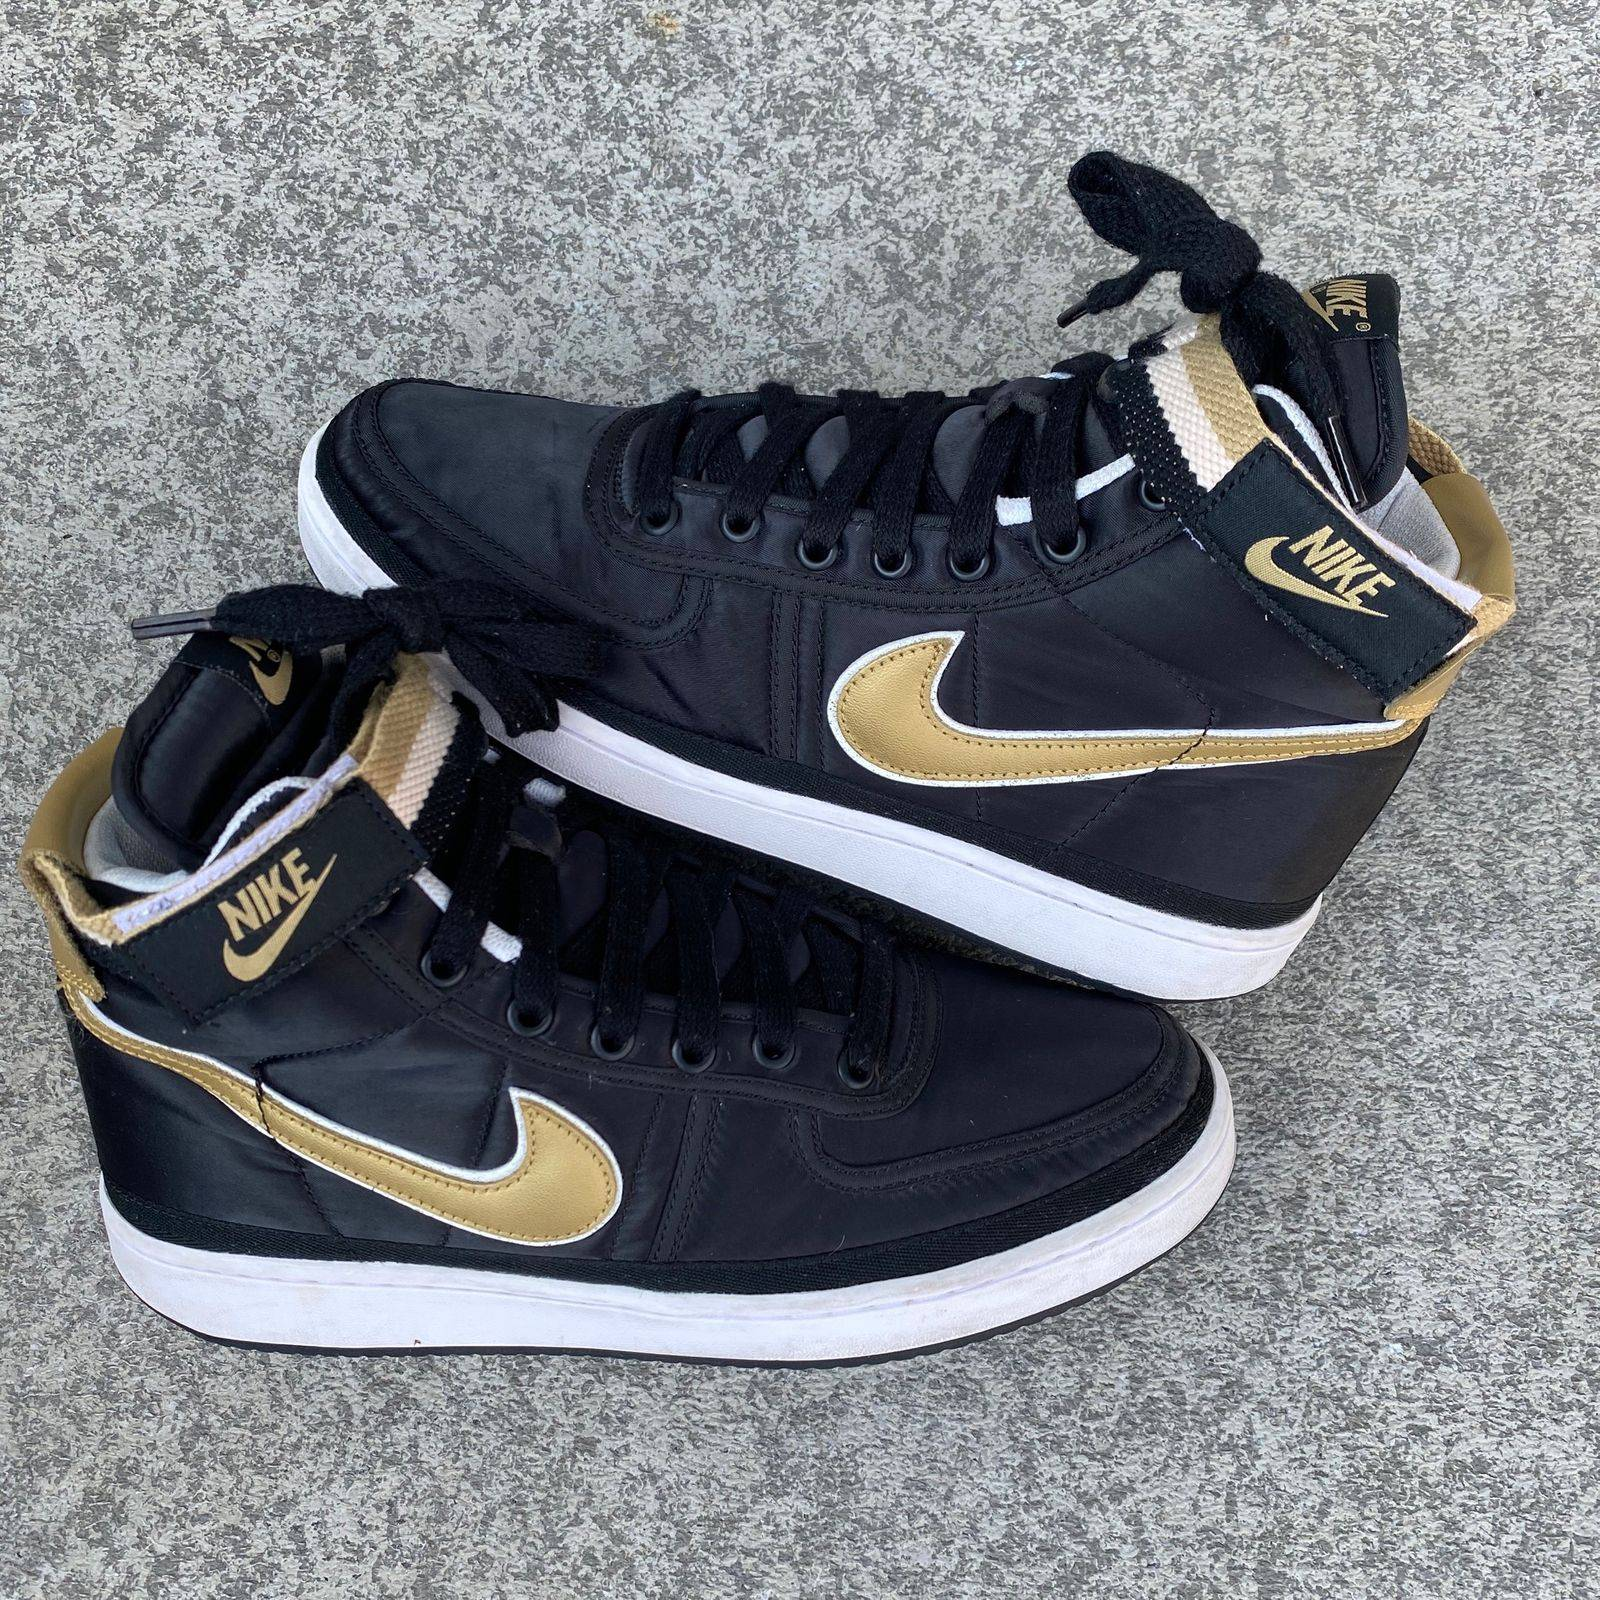 Nike Vandal High Supreme 2018 Black/Gold